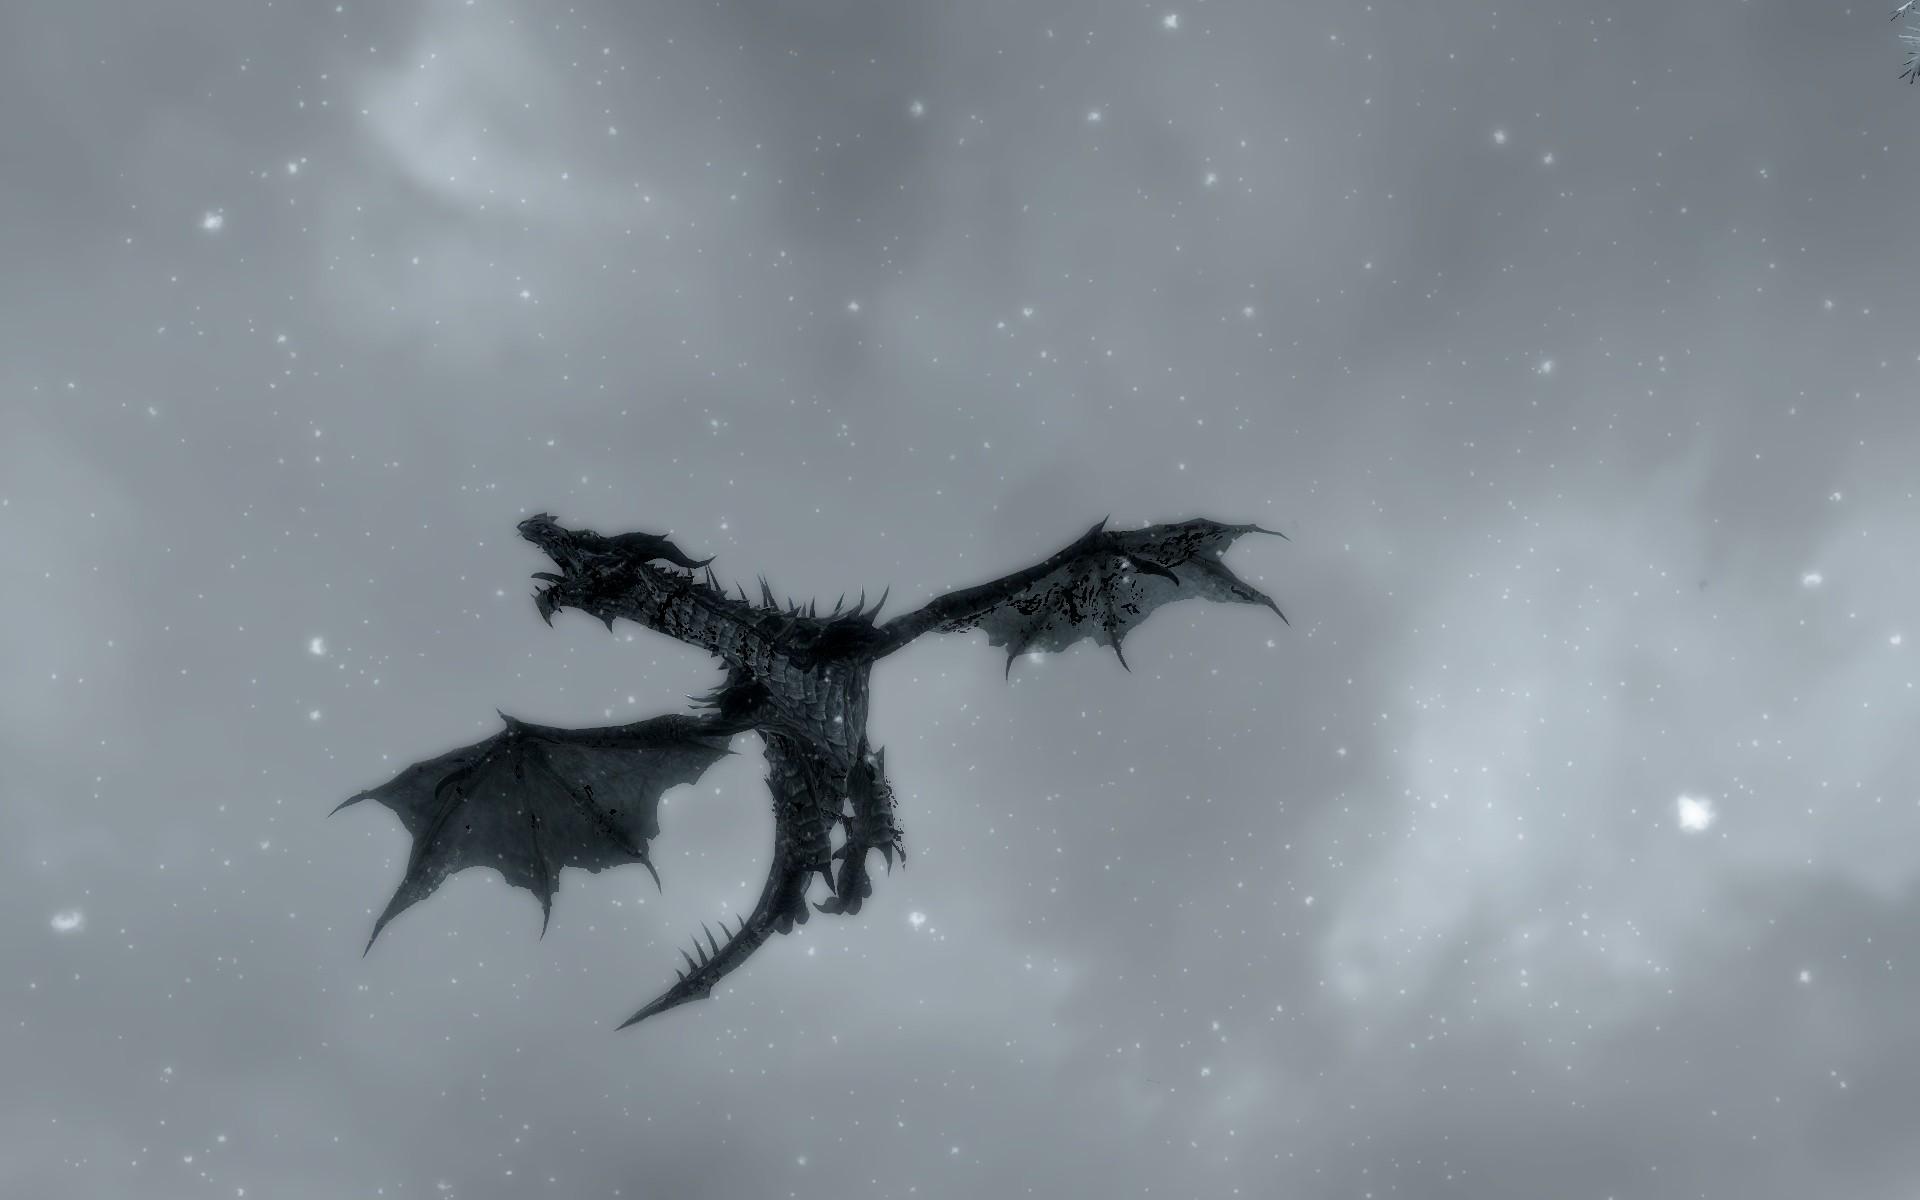 14586872573_a36fc84b16_k.jpg - The Elder Scrolls 5: Skyrim